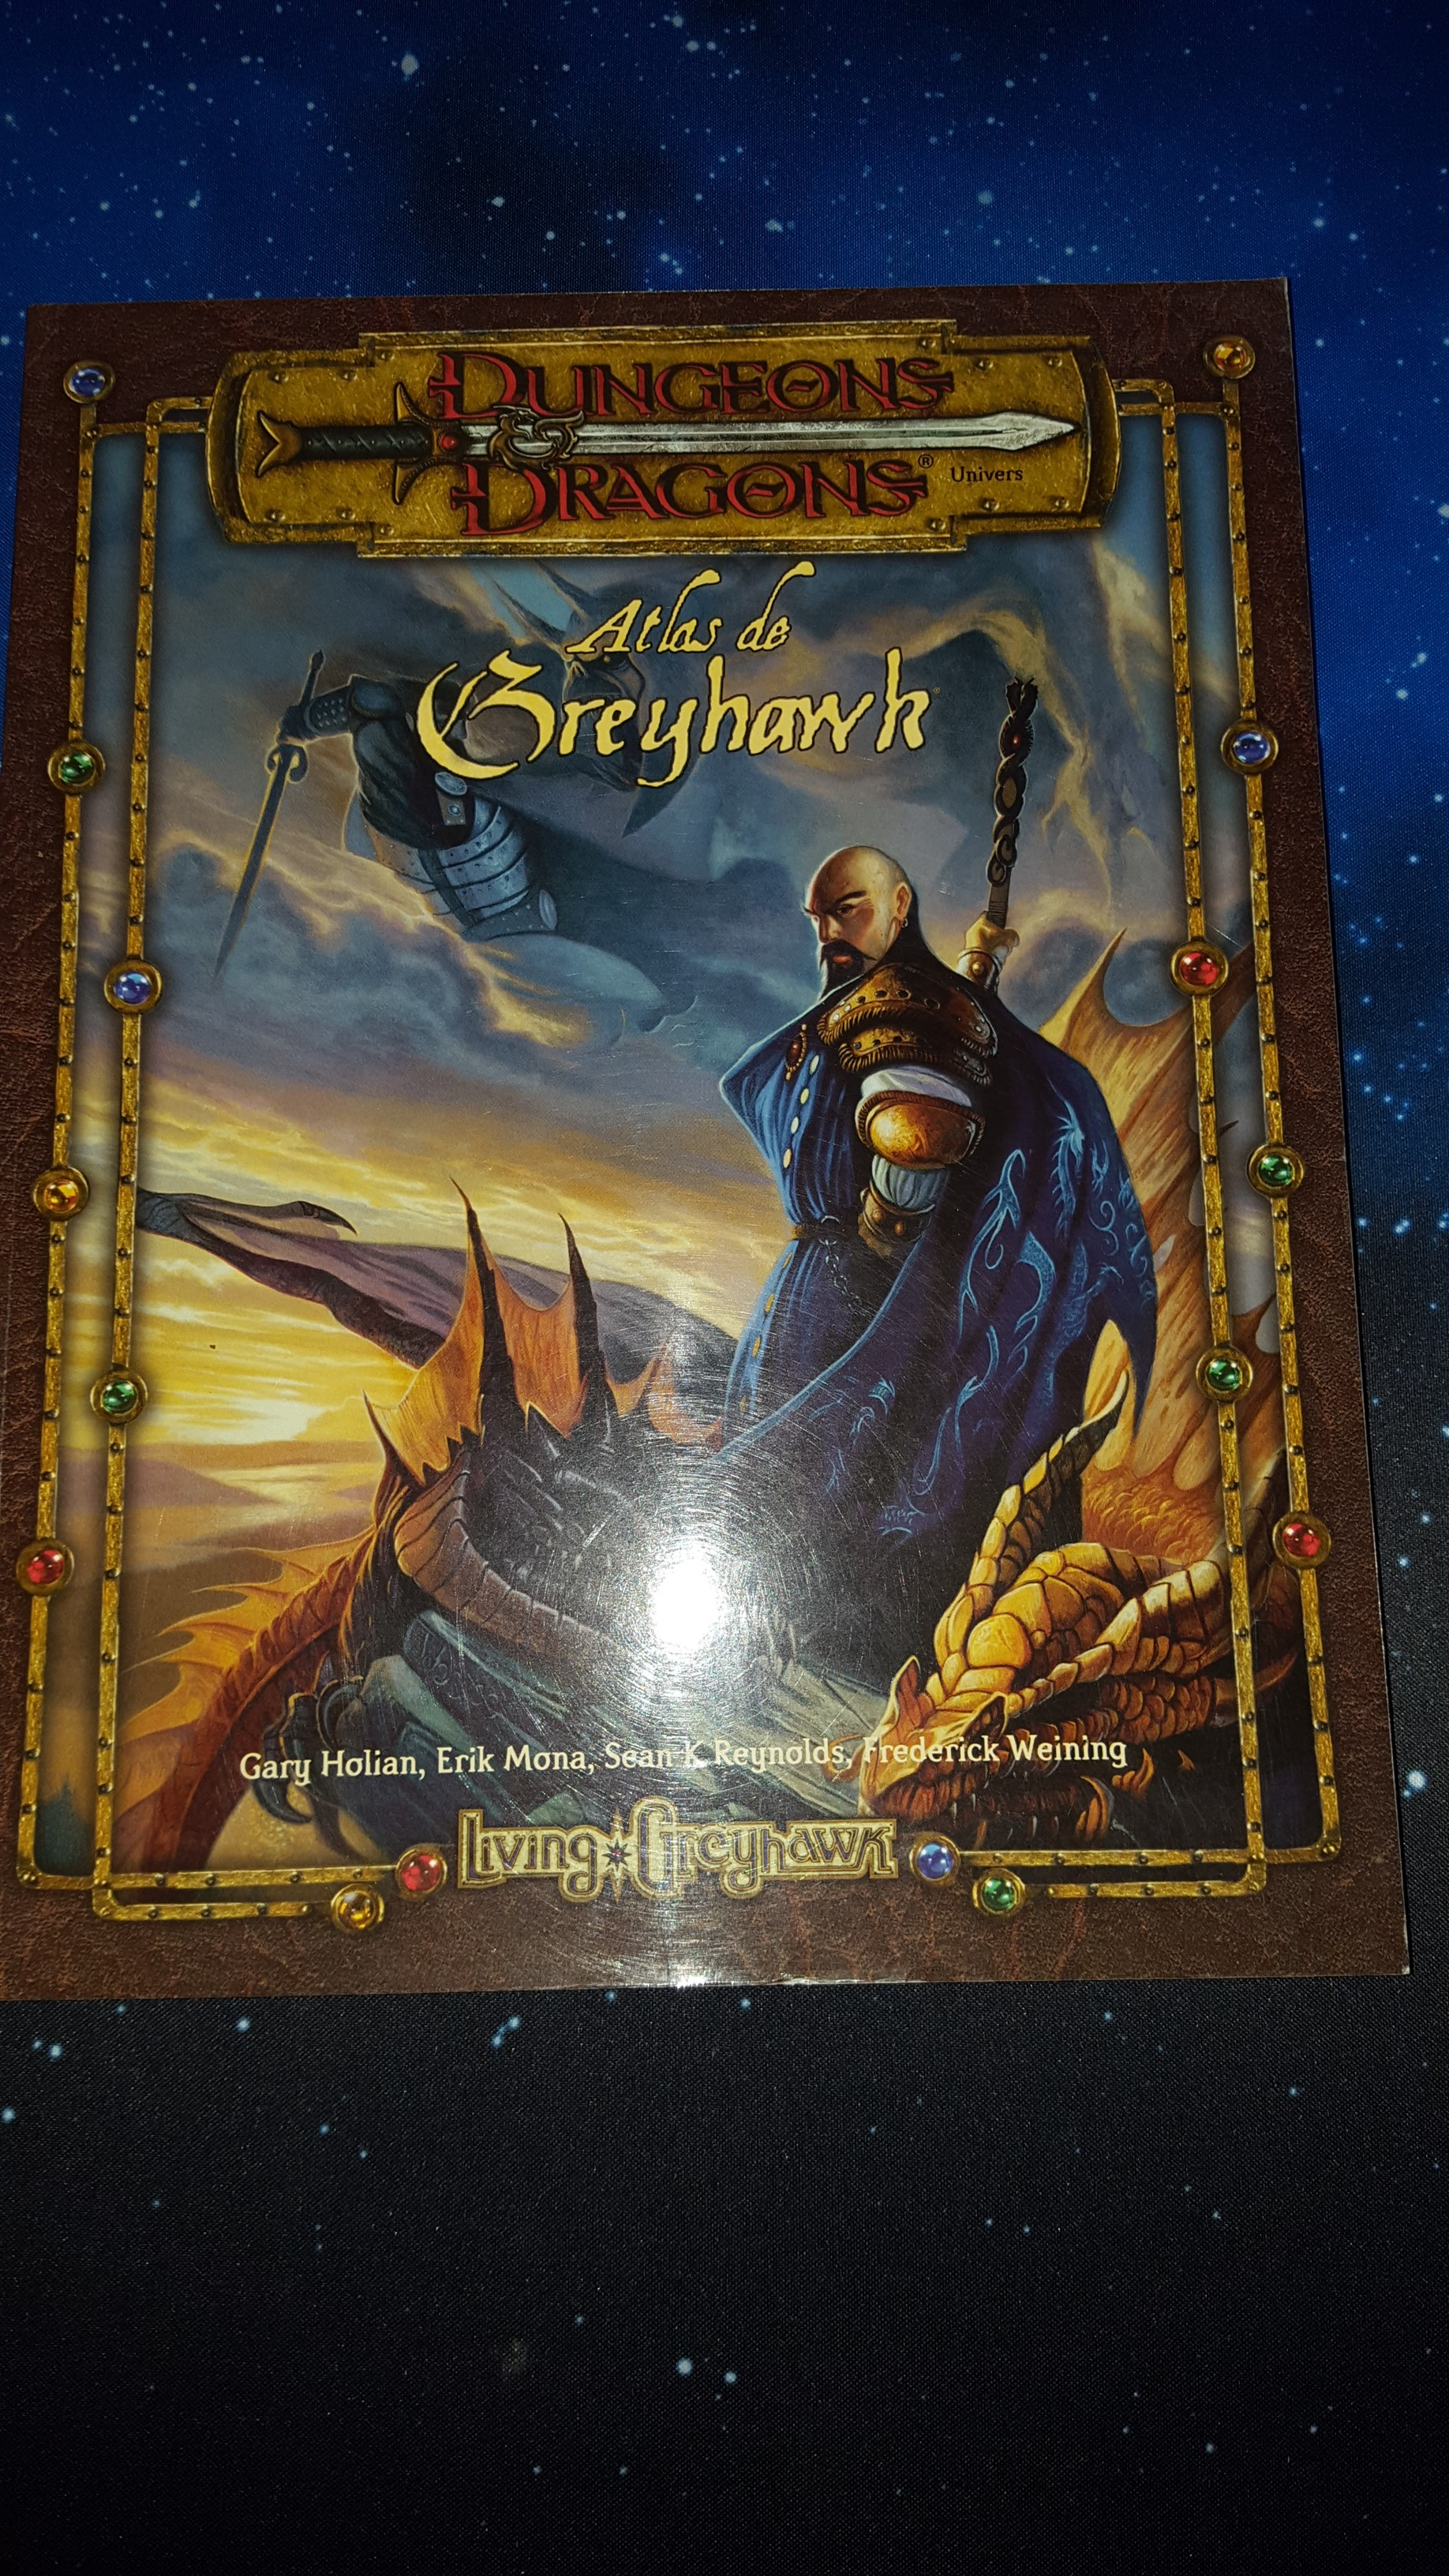 Atlas de gryhawk Donjons et Dragons 3.5 VF